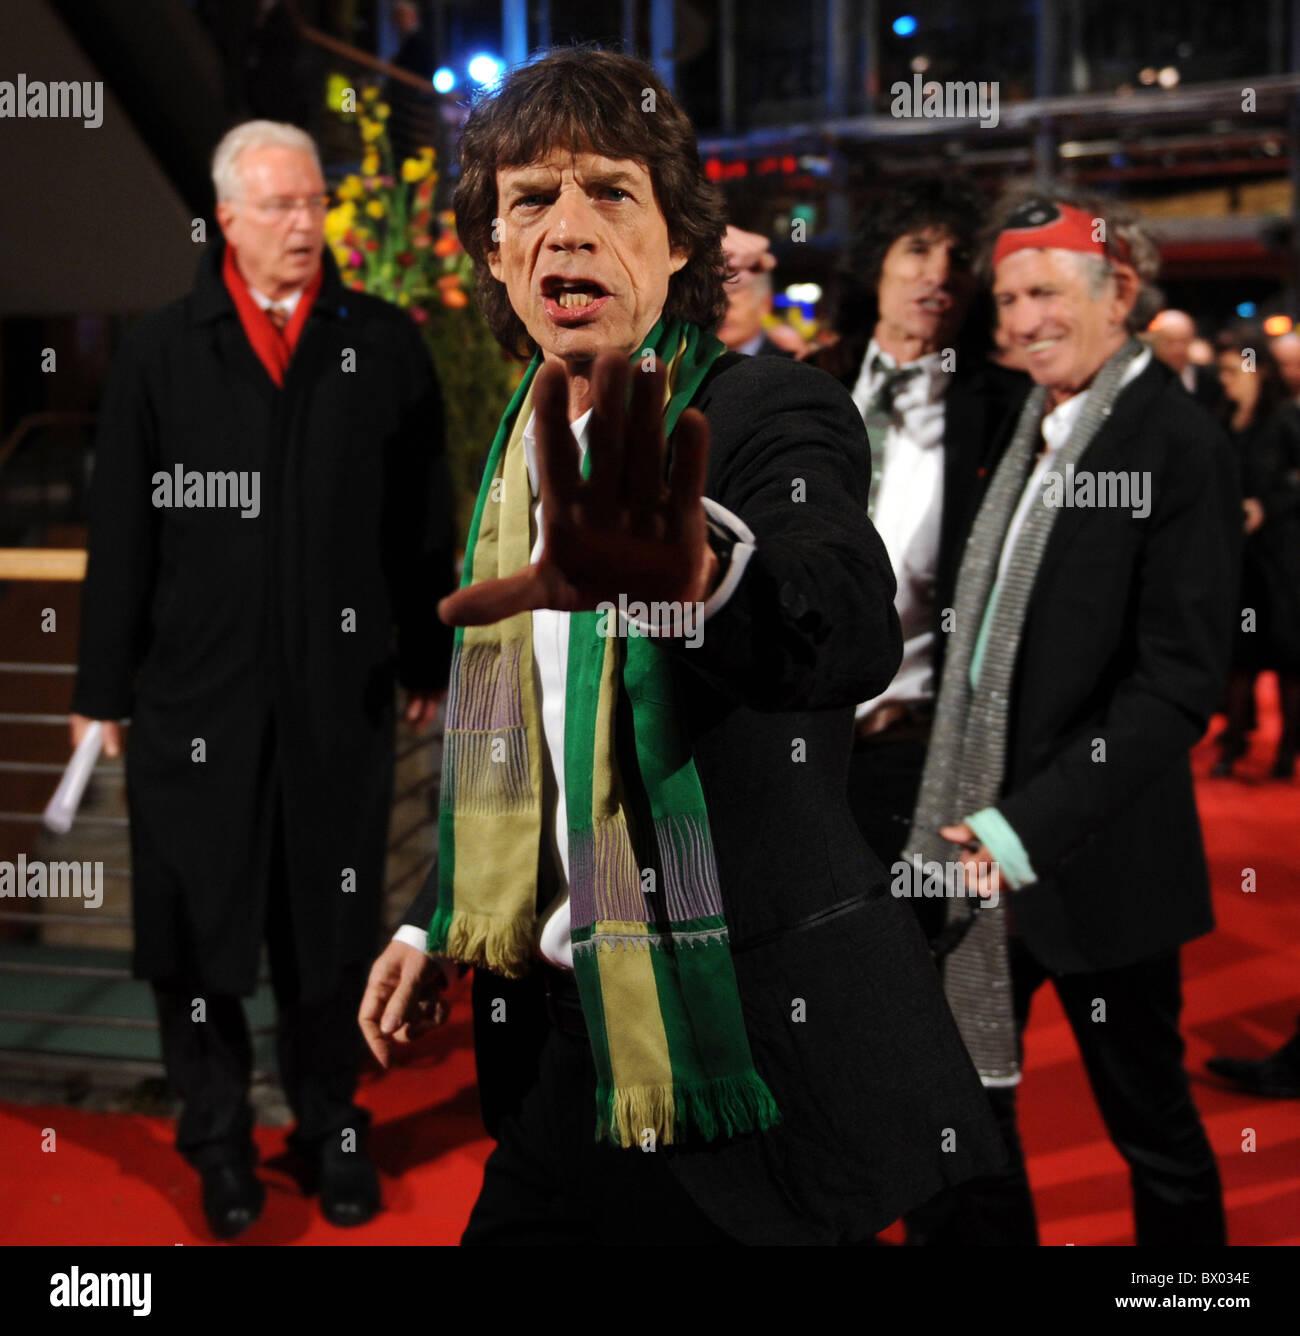 Mick Jagger at Berlinale 2008, Berlin, Germany - Stock Image